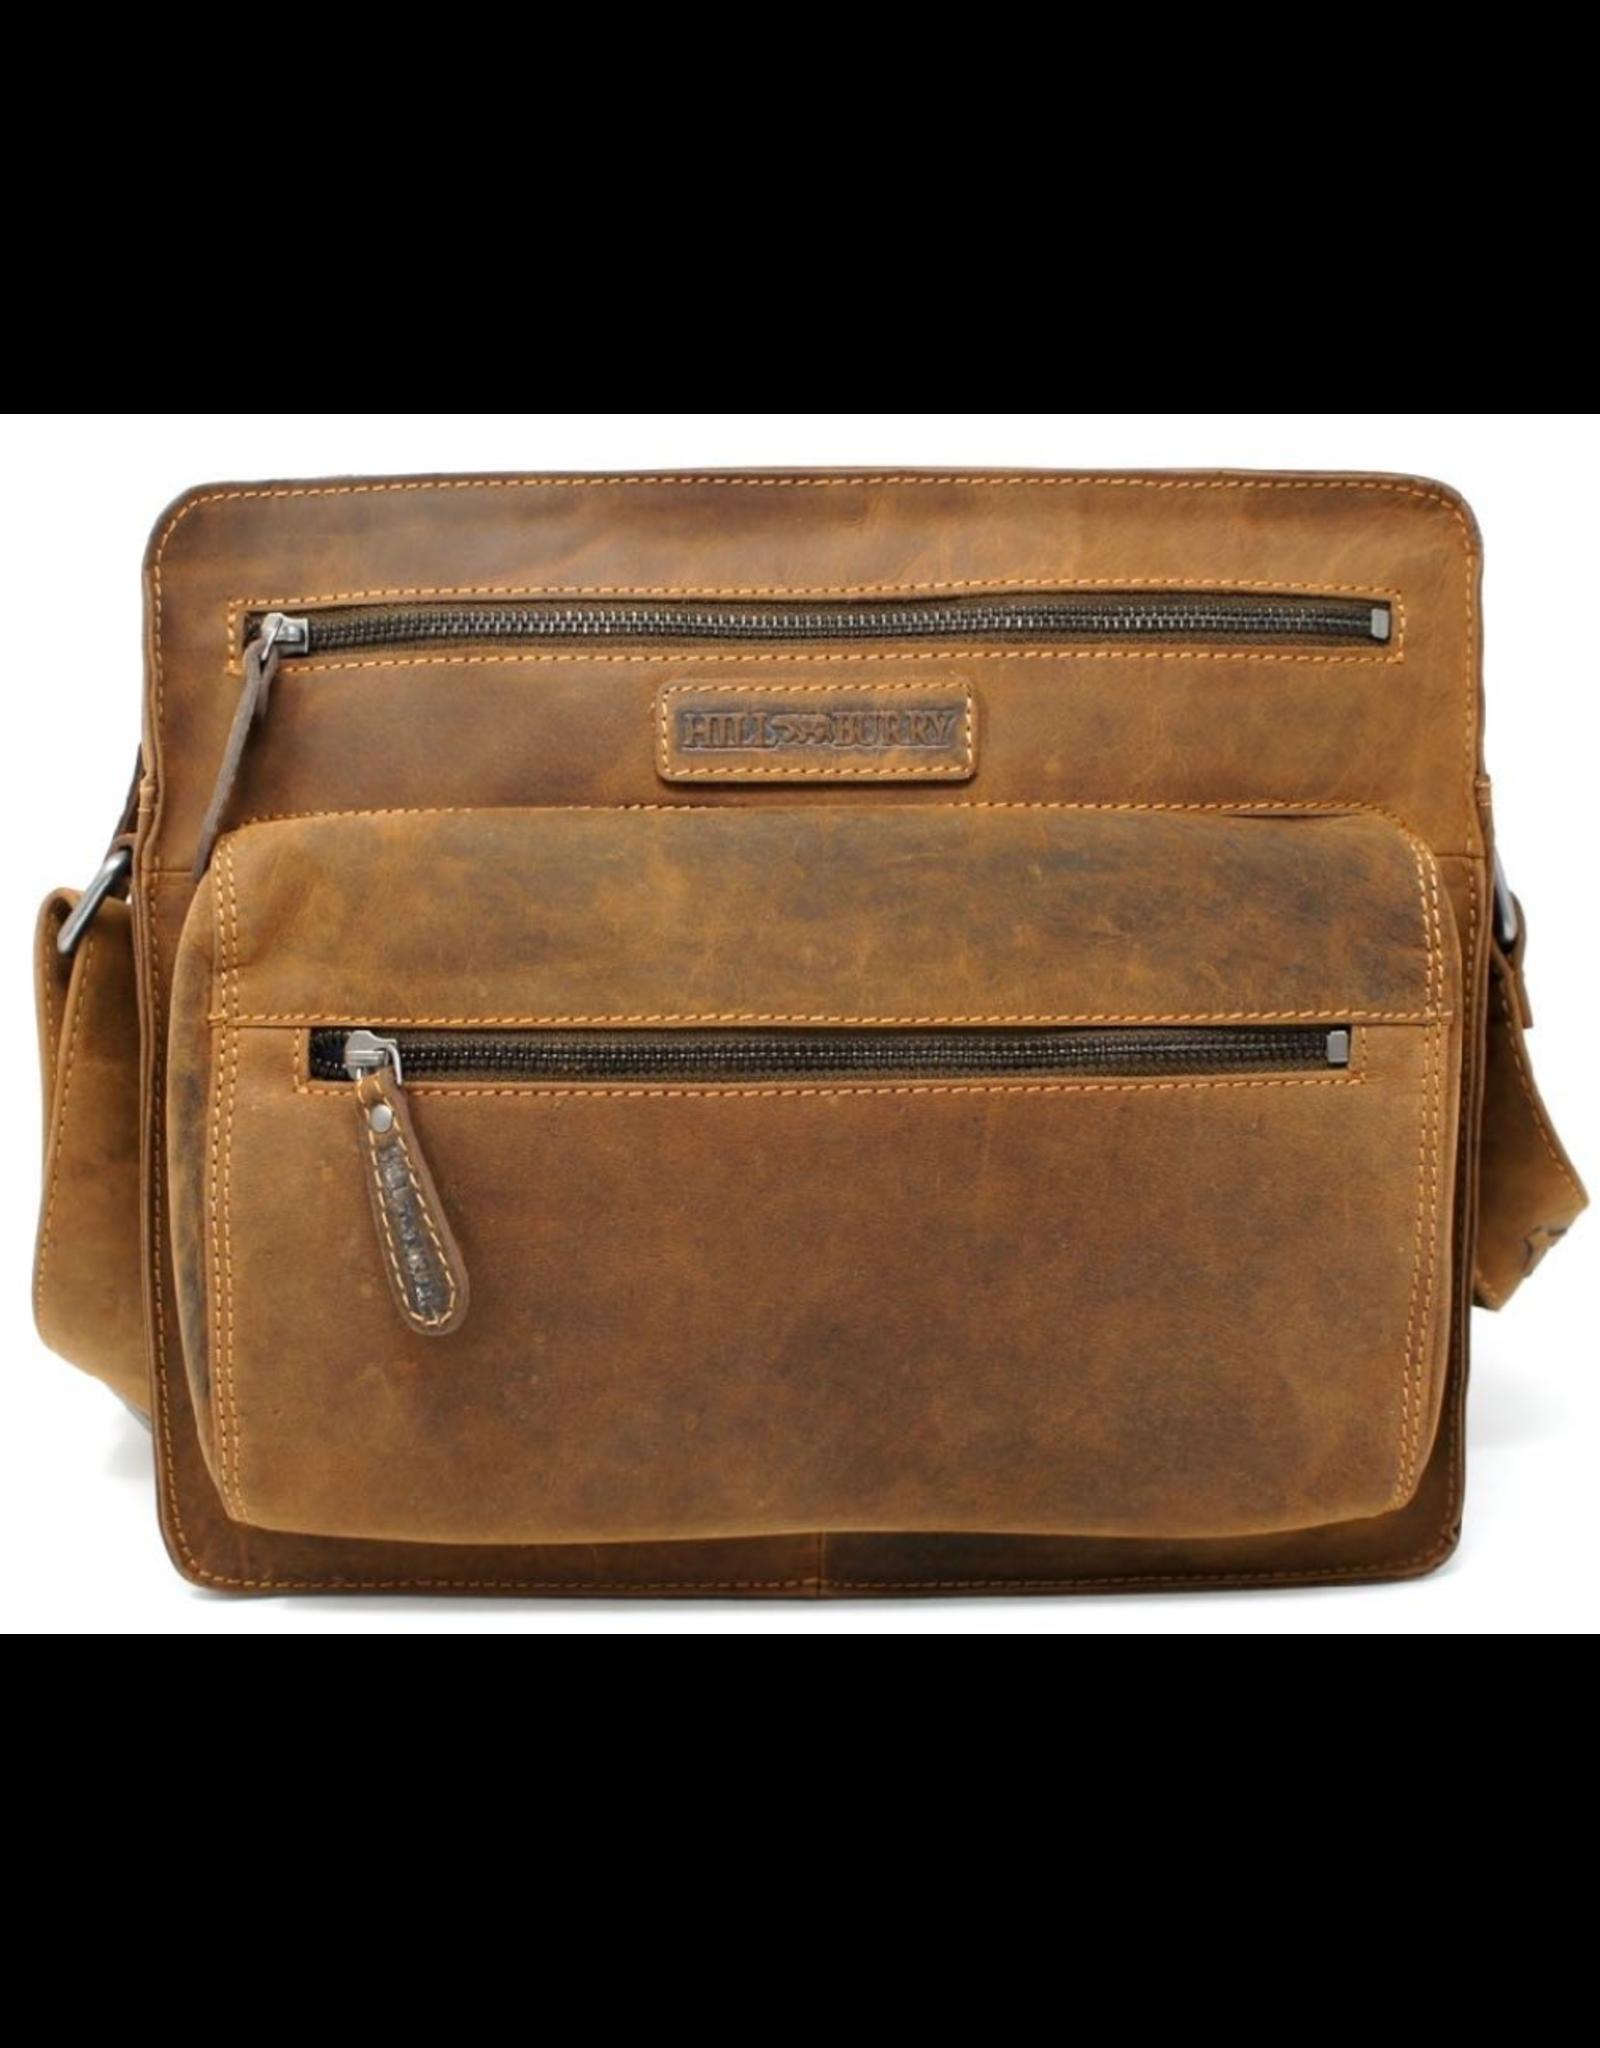 HillBurry Leather bags -  HillBurry Unisex Leather Shoulder Bag (rectangle model)